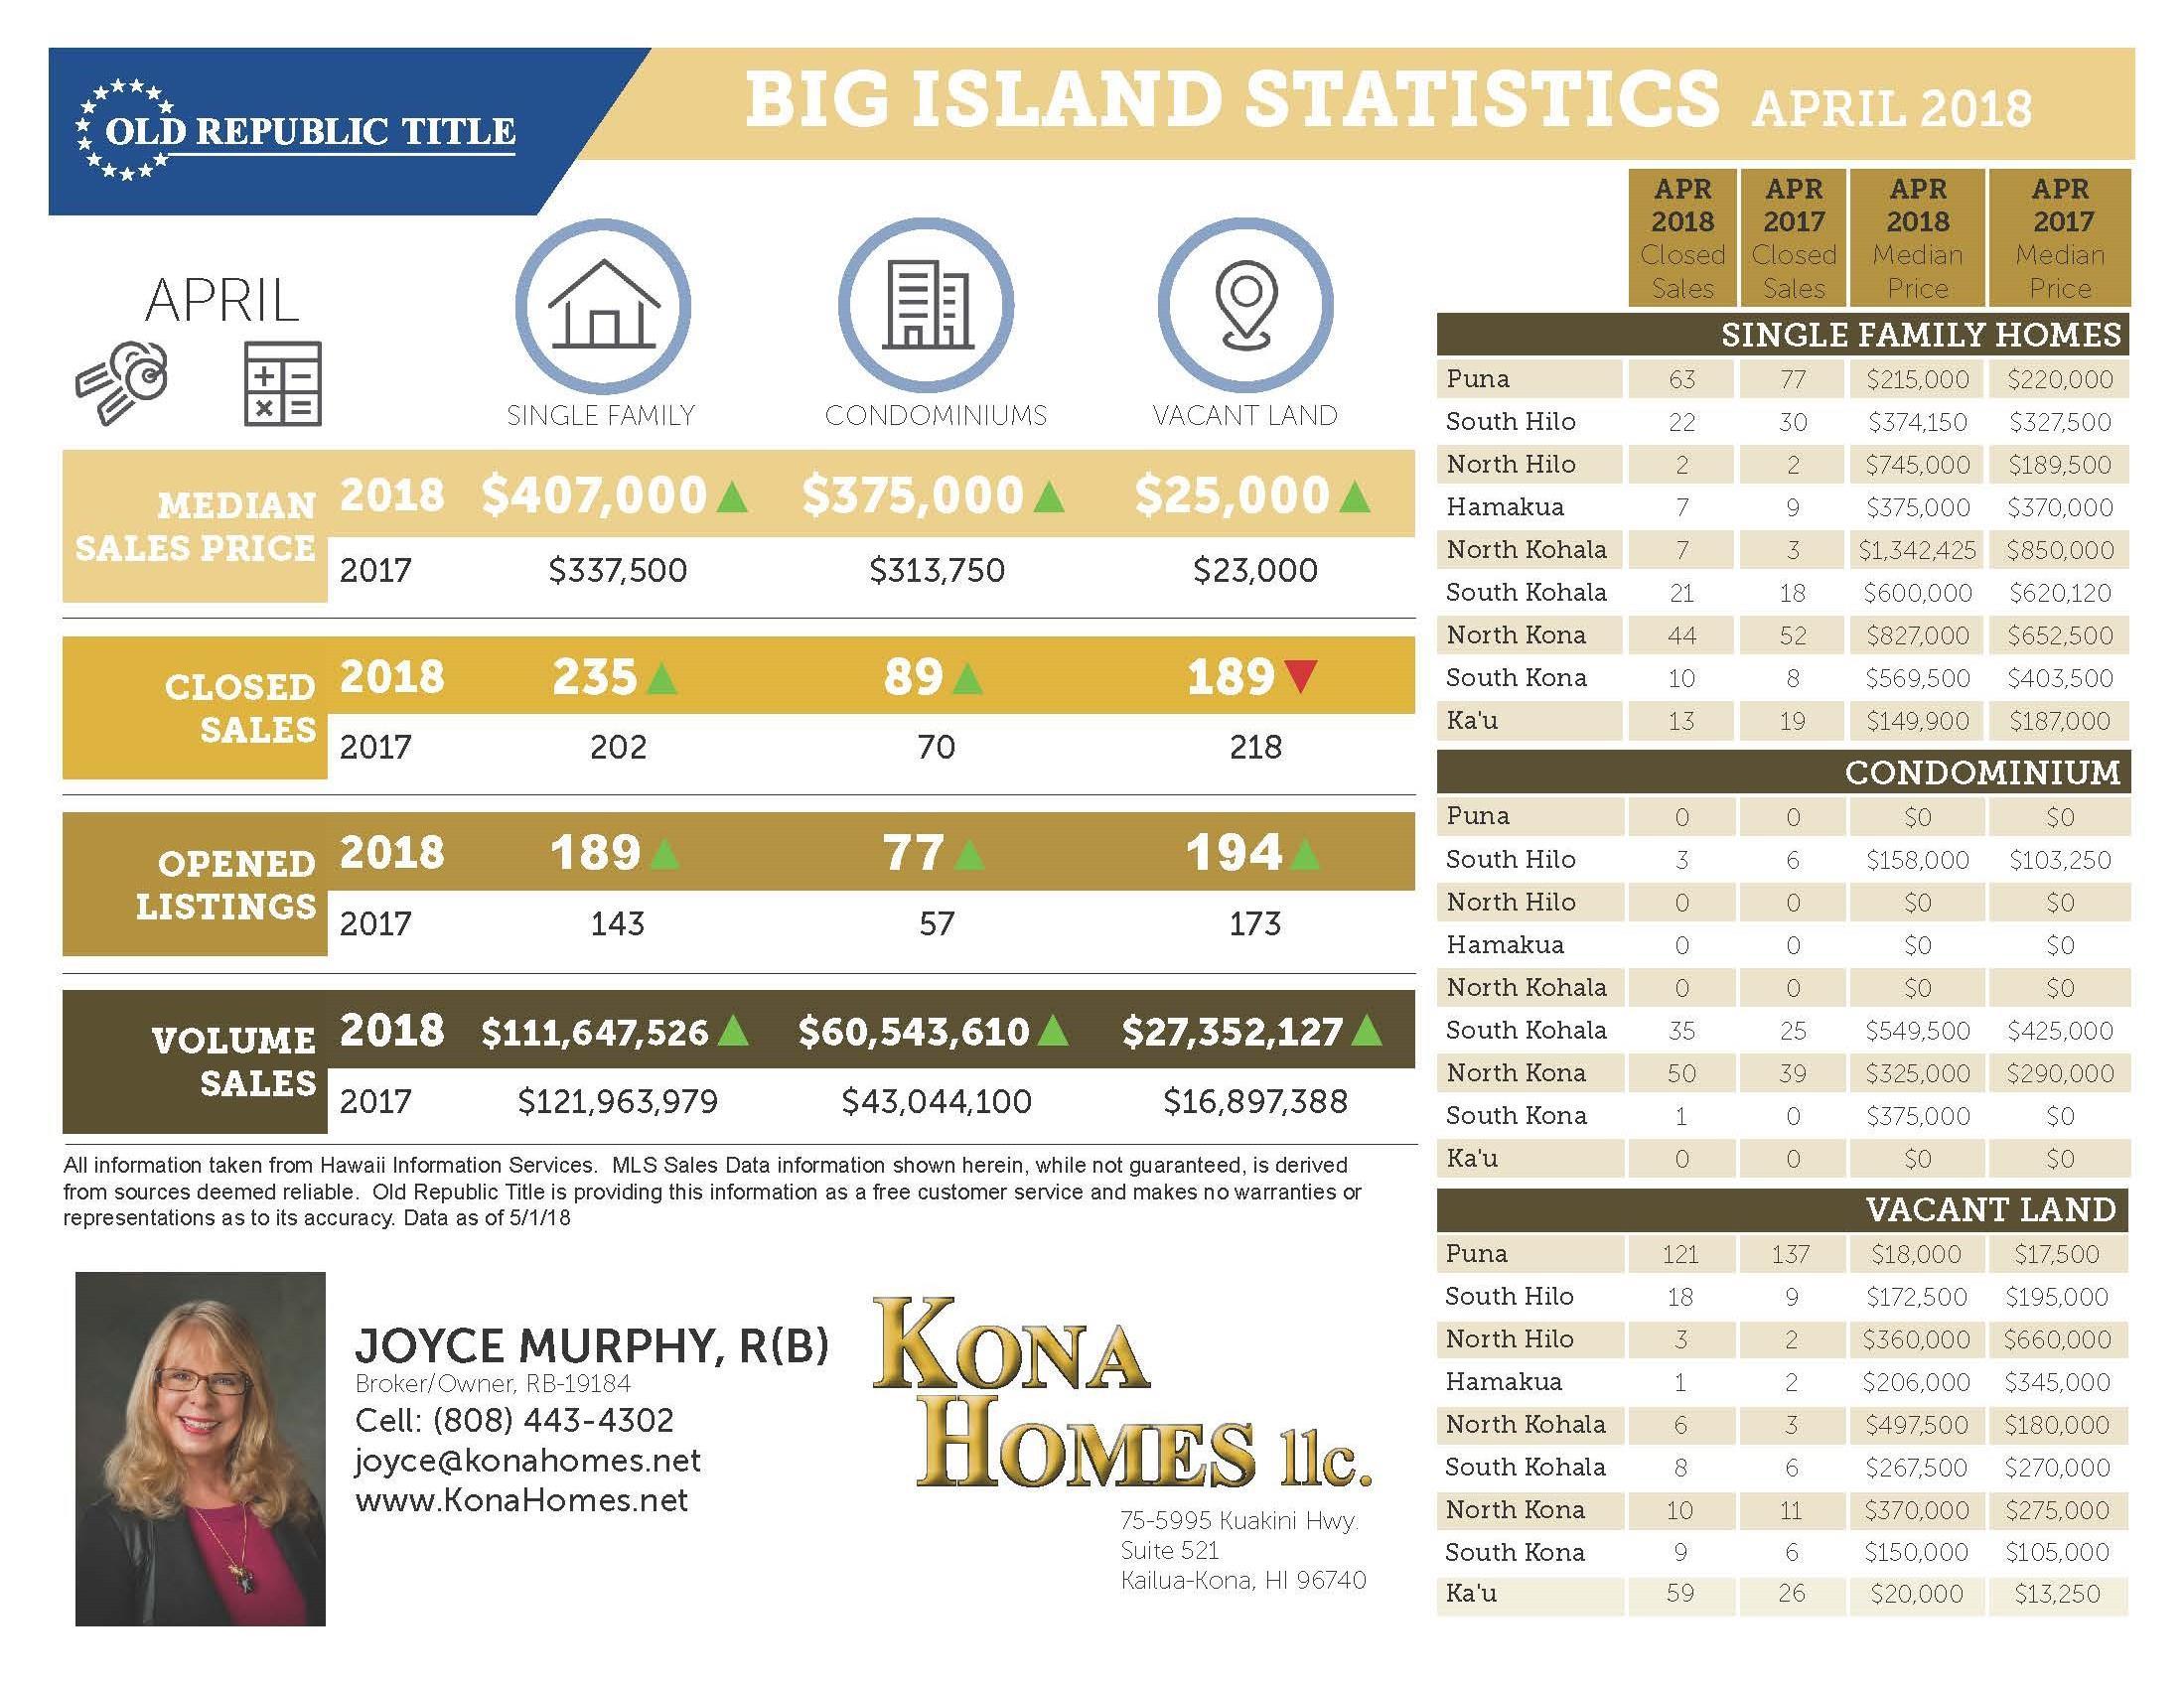 Big Island Statistics April 2018